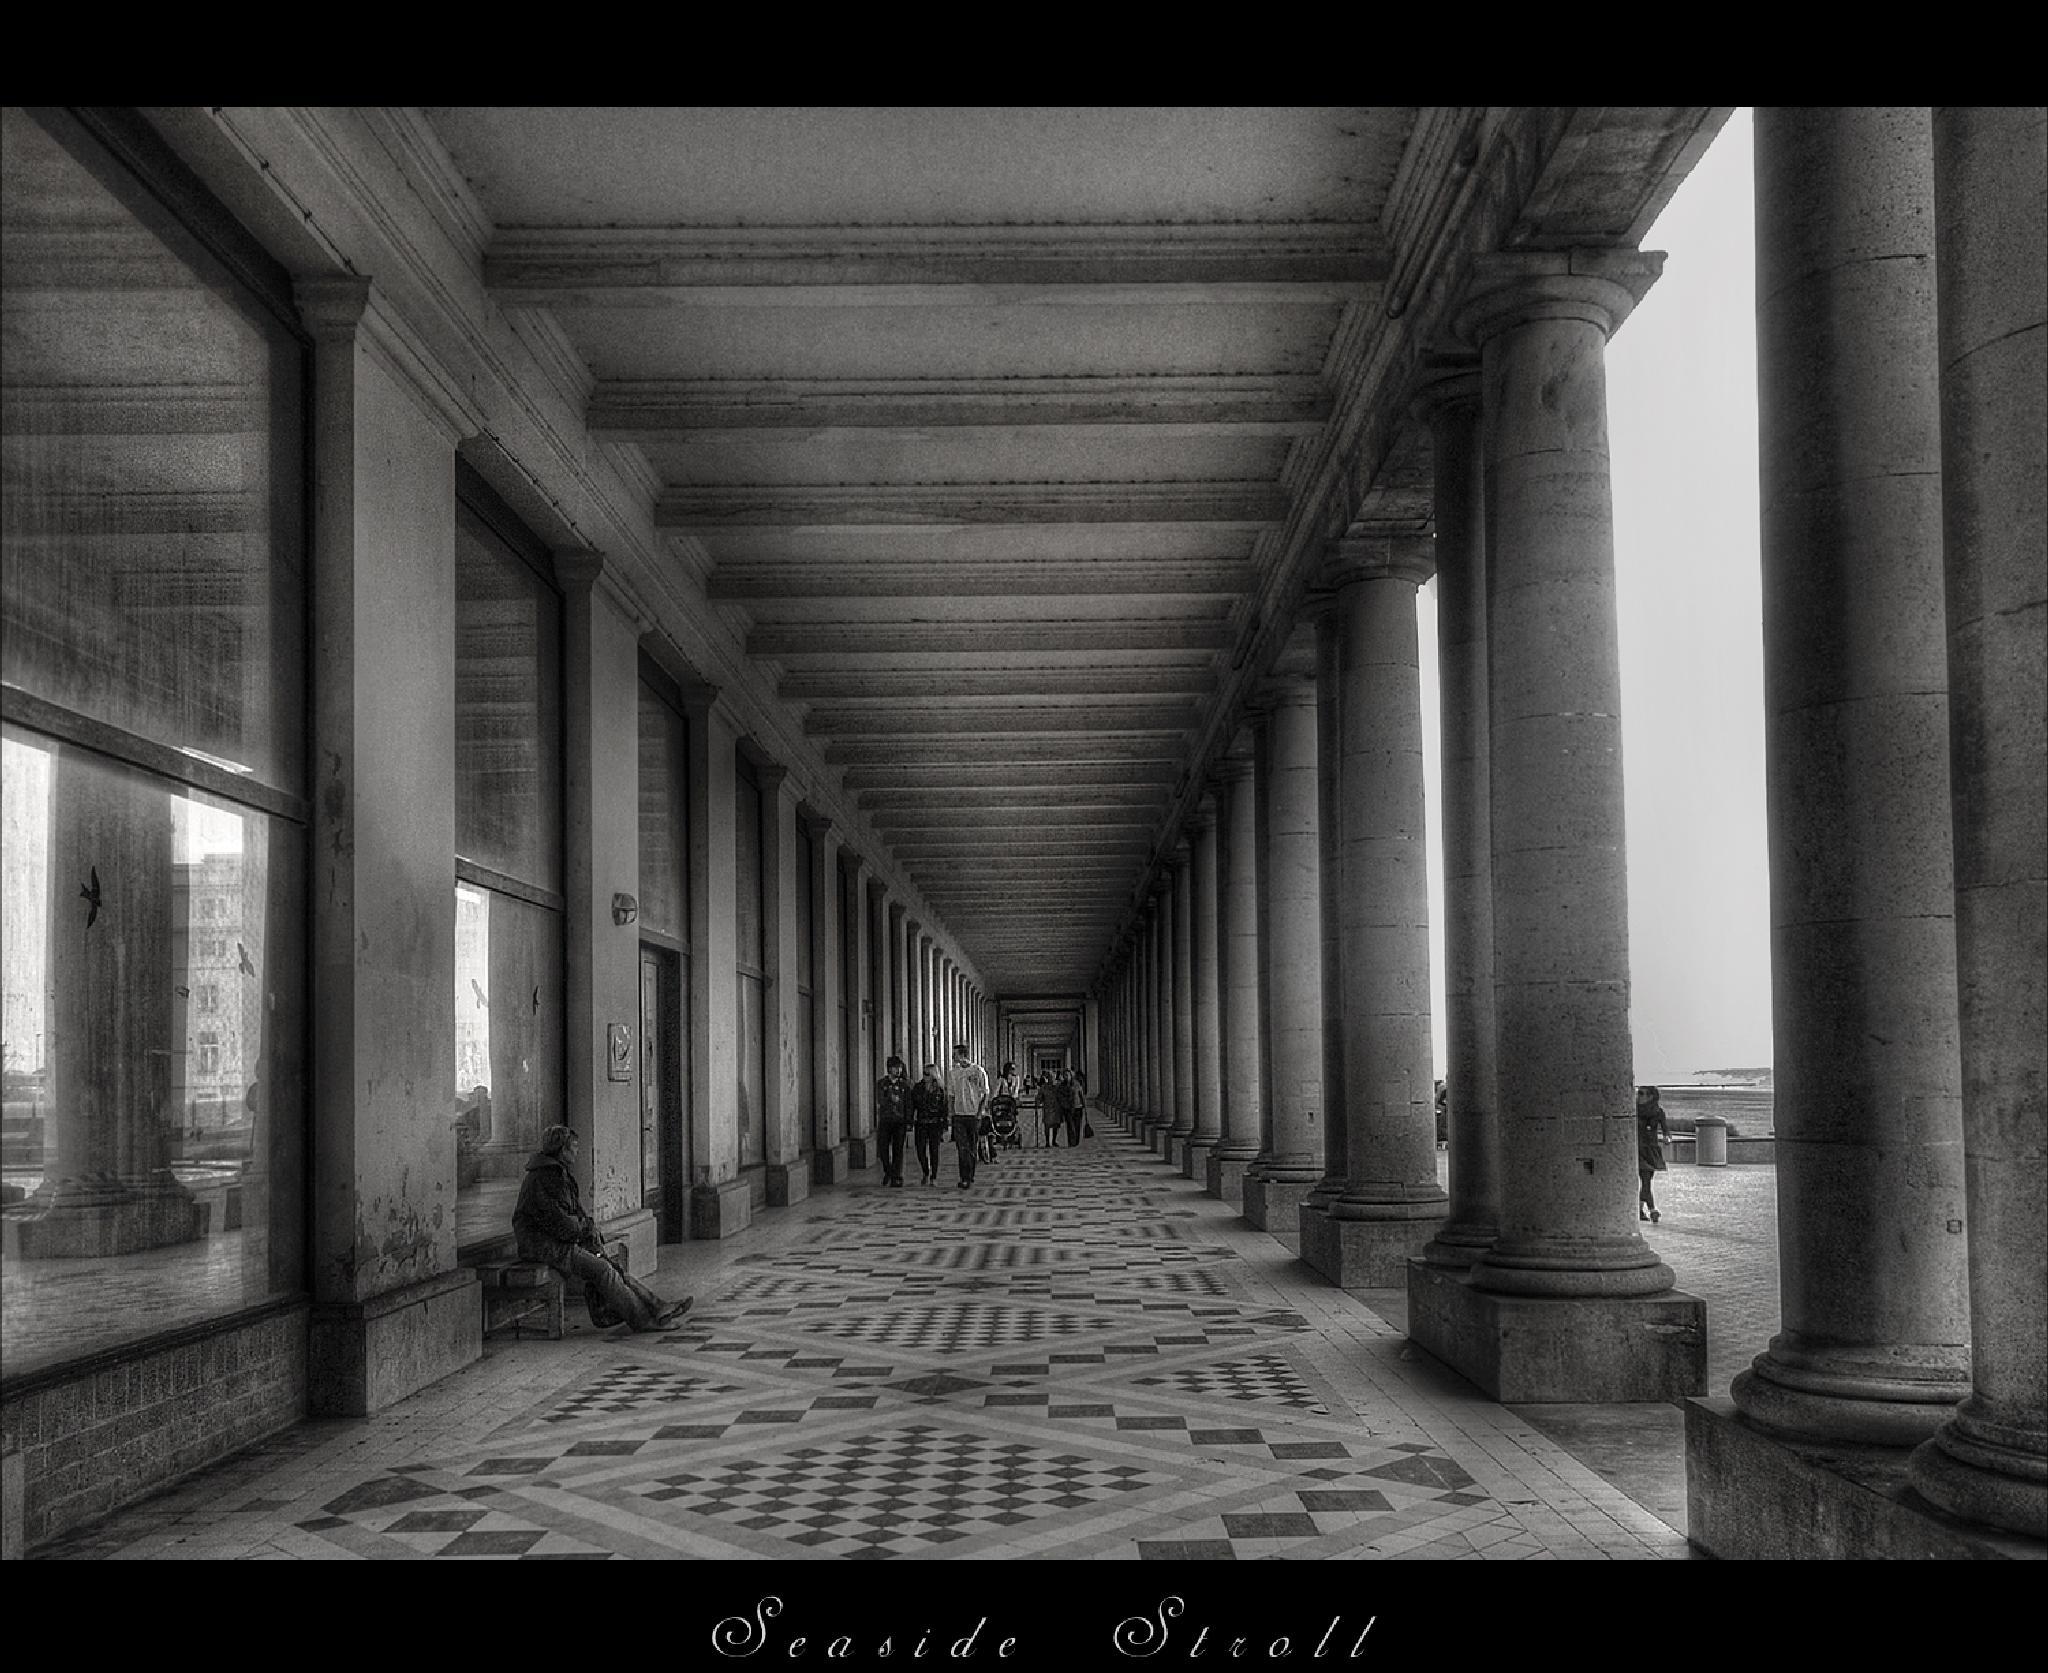 - Seaside stroll -  by NathalImage